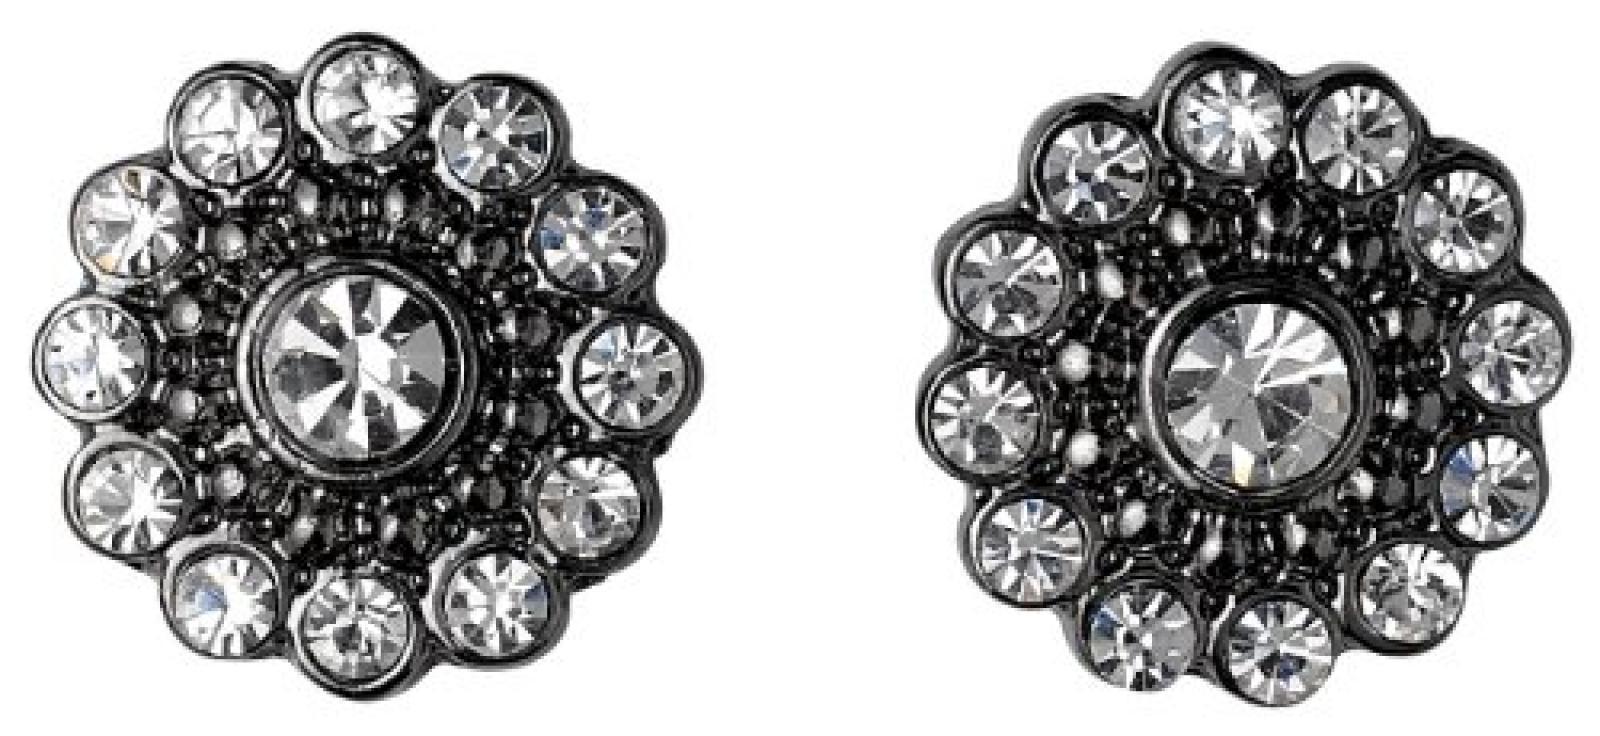 Pilgrim Jewelry Damen-Ohrstecker Messing Kristall Ear post 1.0 cm  weiß 281343013